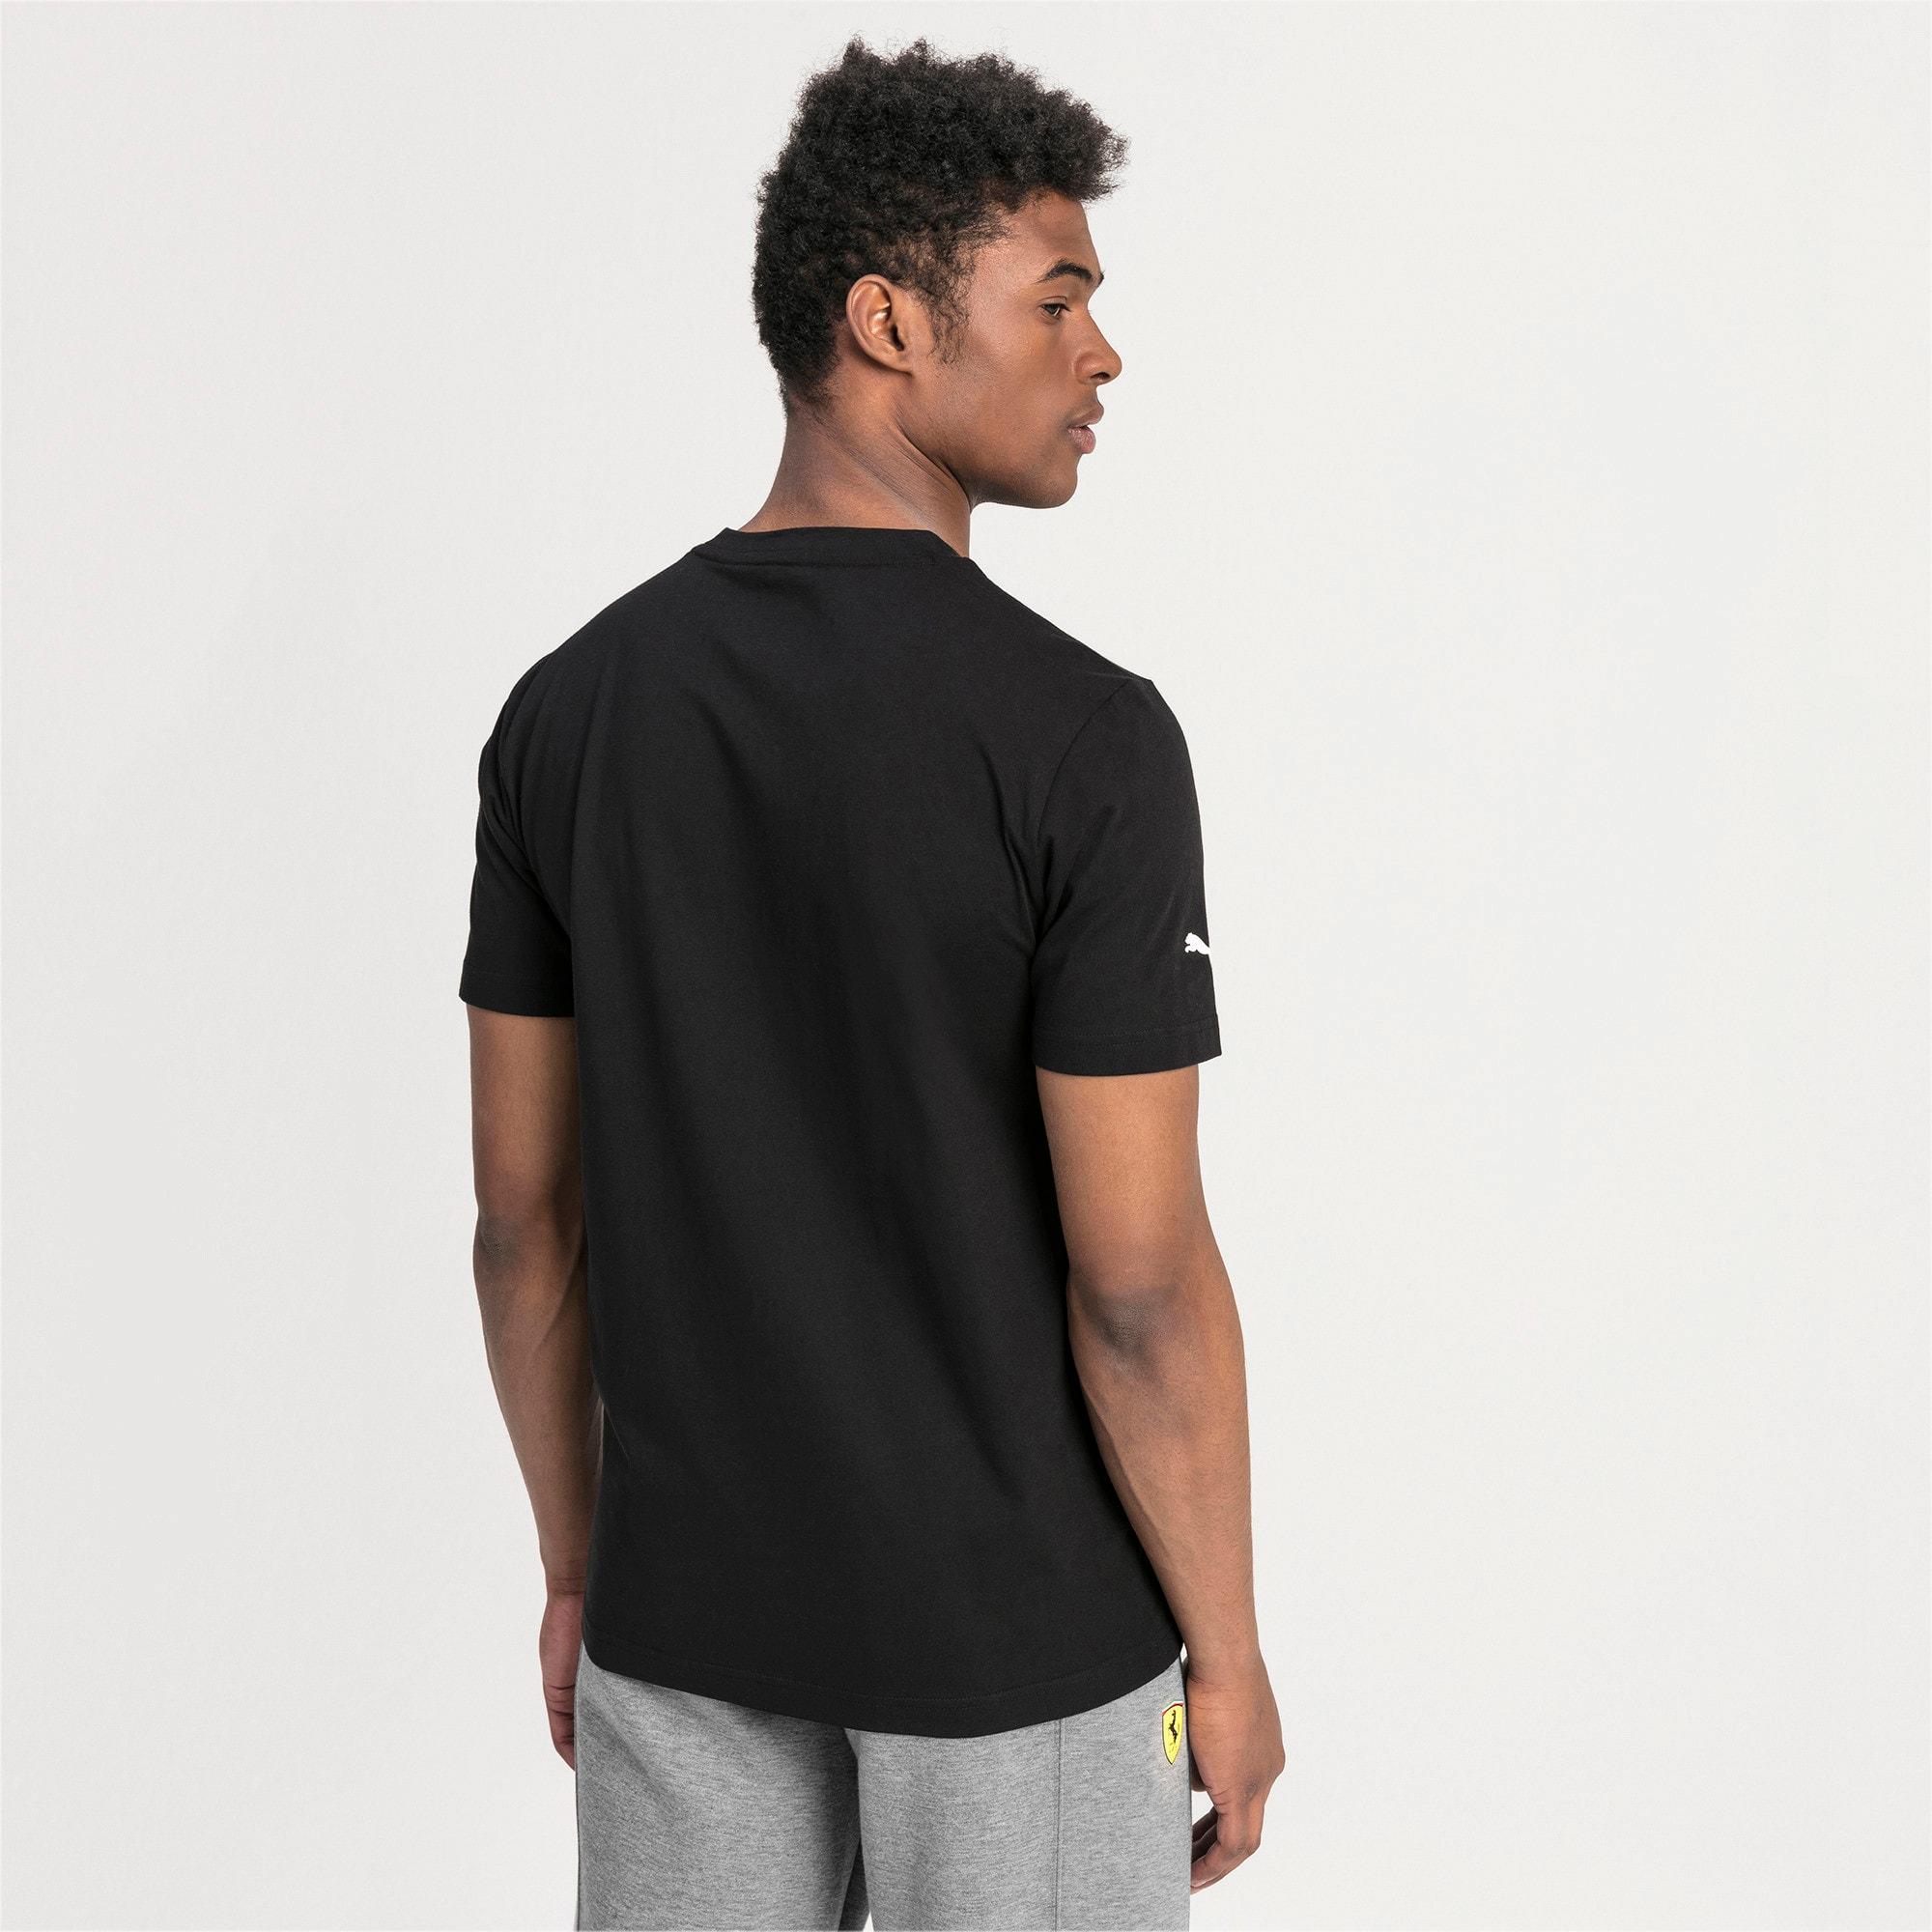 Thumbnail 2 of T-shirt Ferrari Big Shield uomo, Puma Black, medium